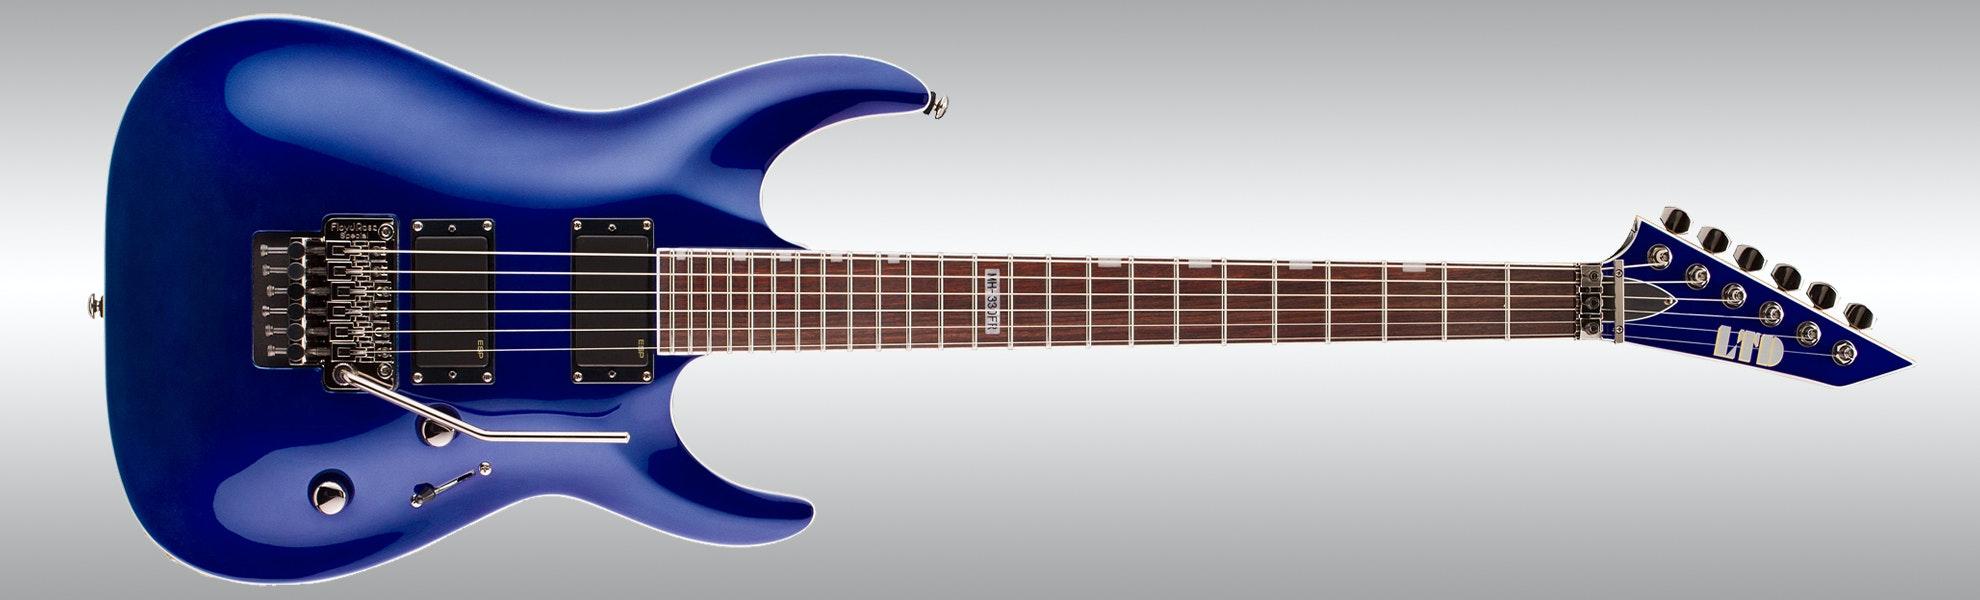 ESP LTD MH-330FR EB B-Stock Electric Guitar